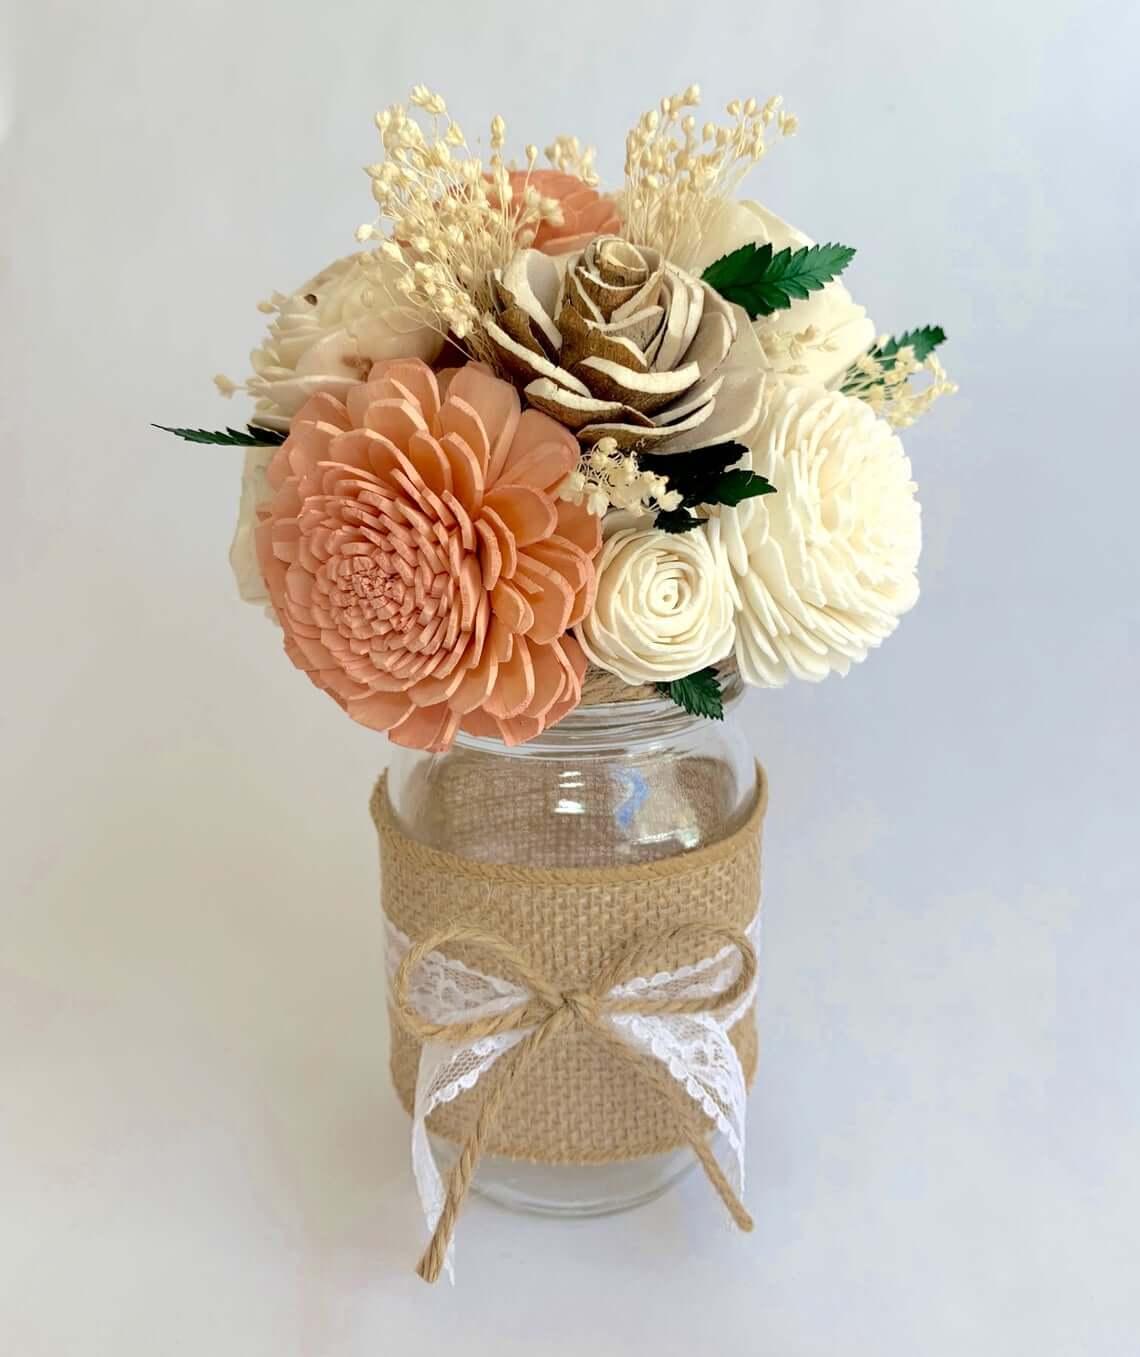 Rustic Country Burlap and Bows Jar Vase